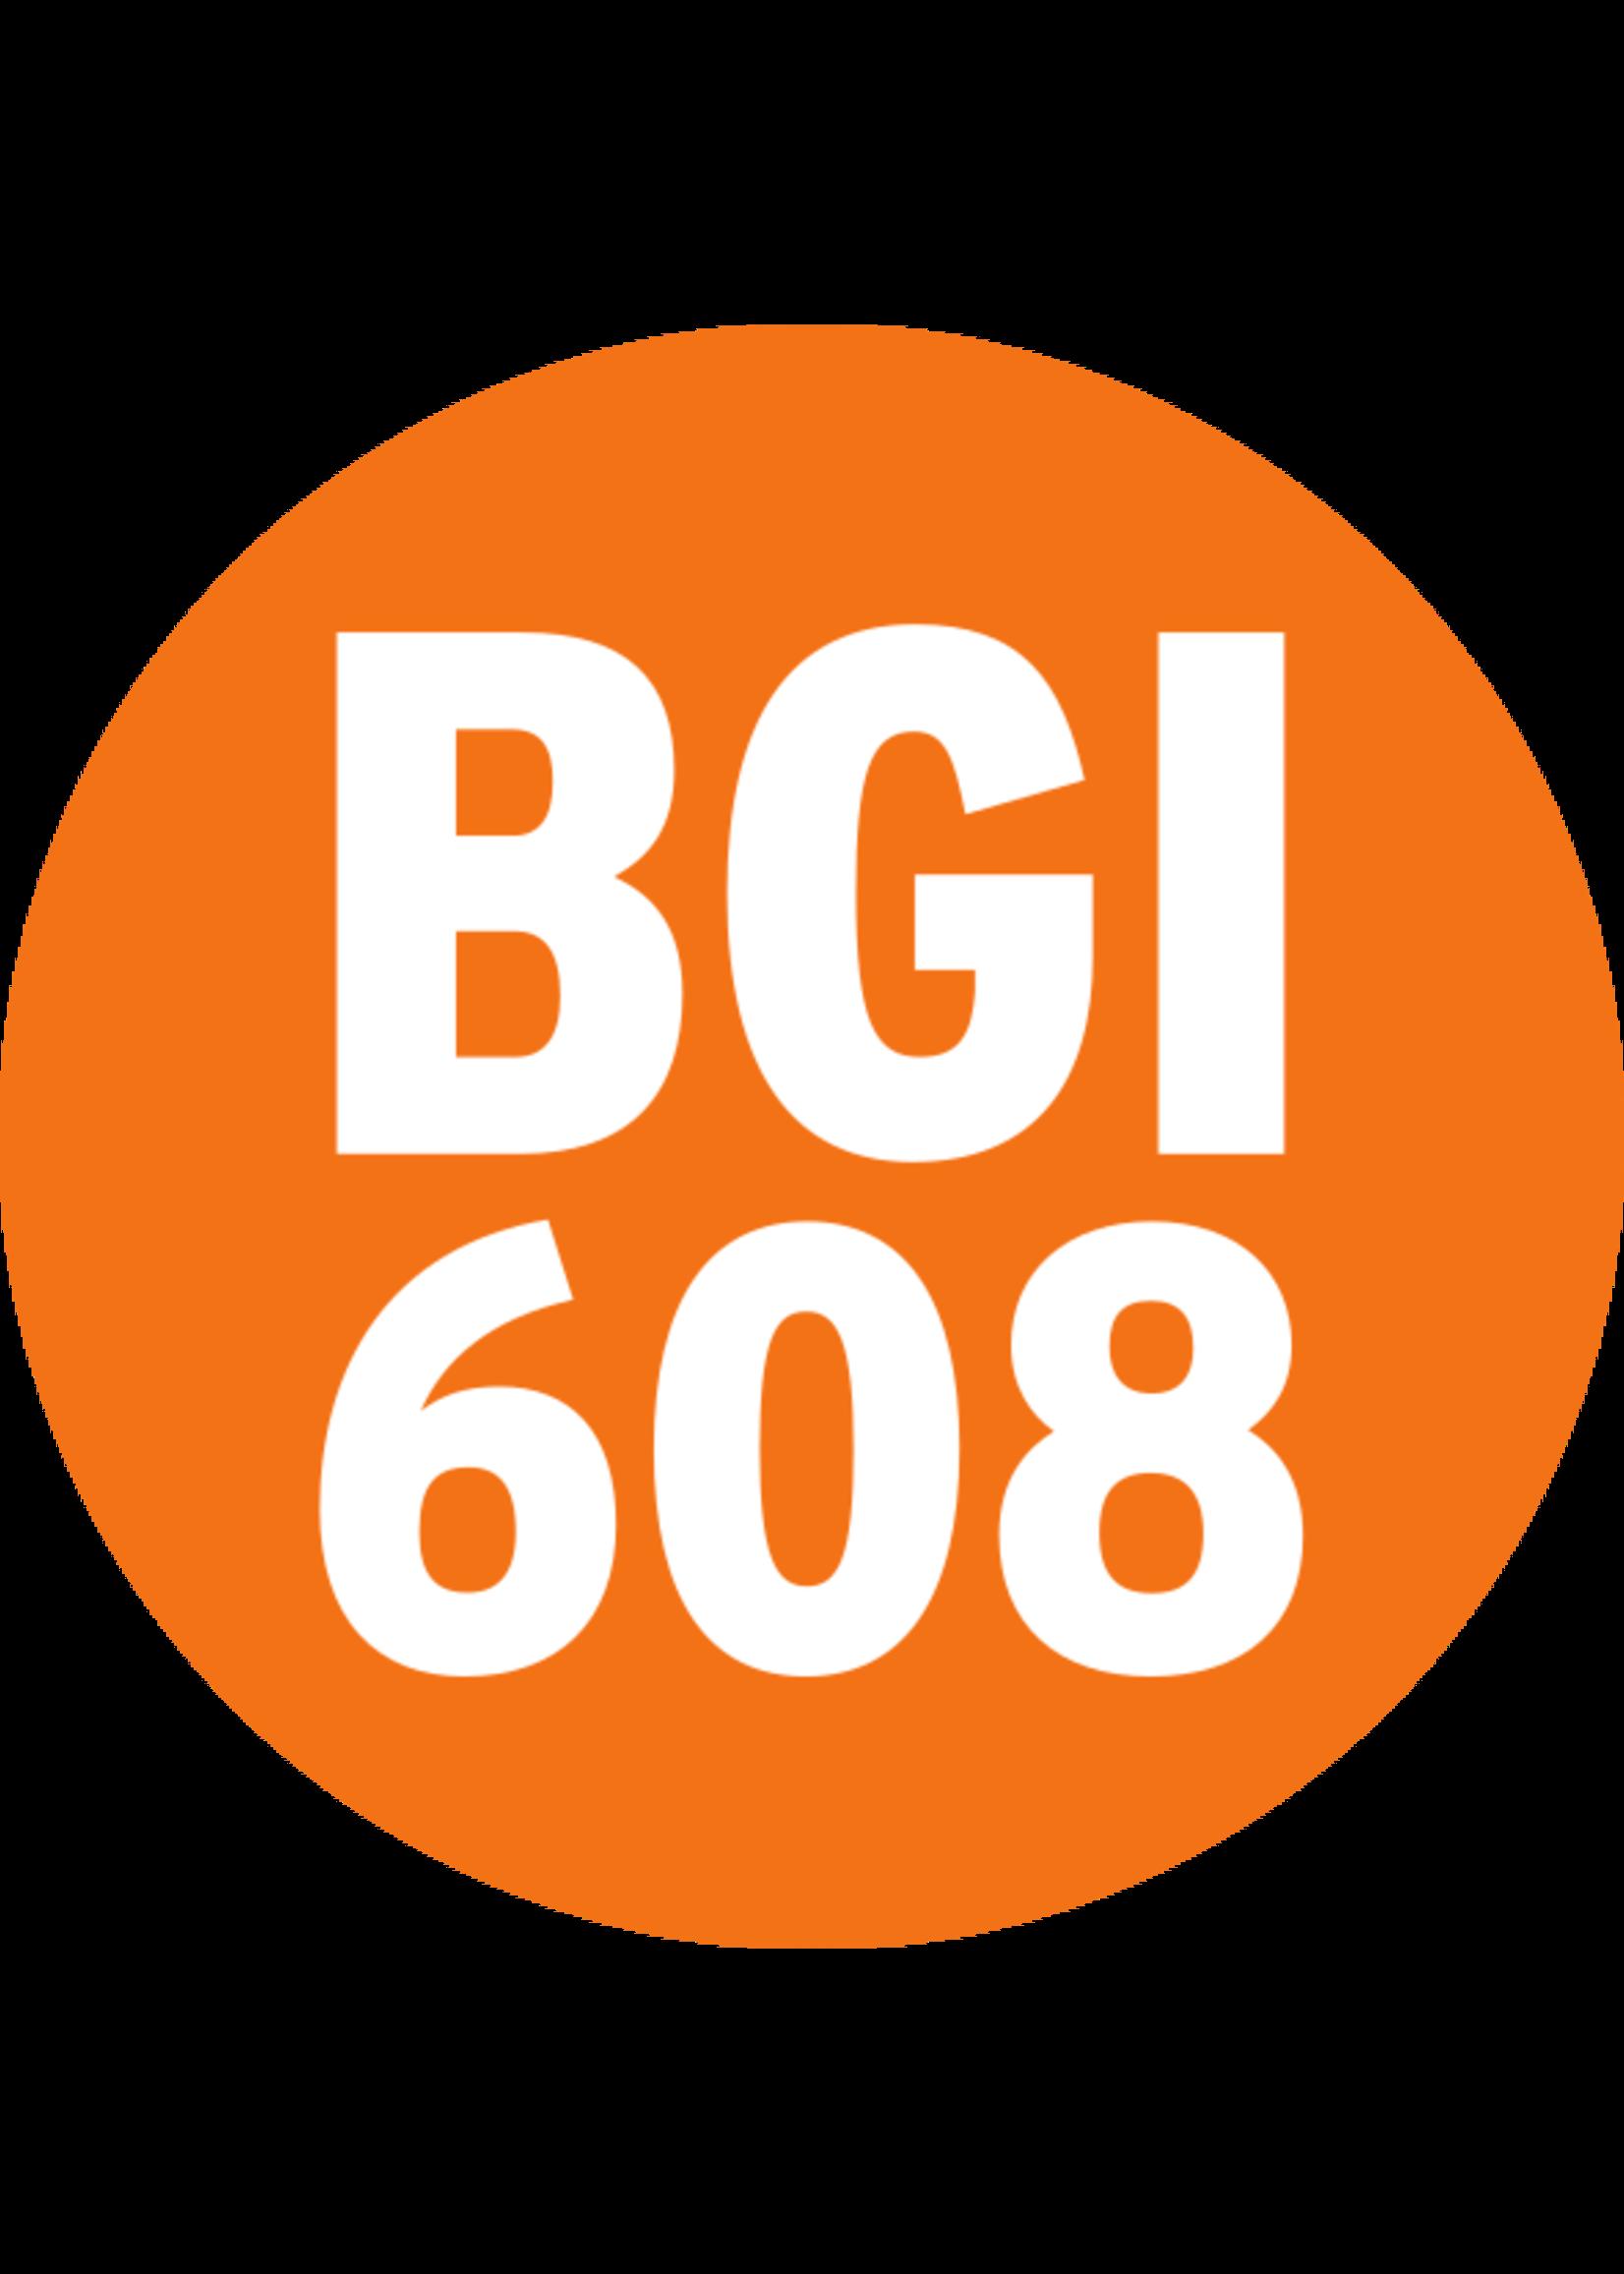 Brennenstuhl Brennenstuhl ProfessionalLINE 9161100100 Verlengkabel - IP44 - H07RN-F3G1.5 - 10m - Zwart